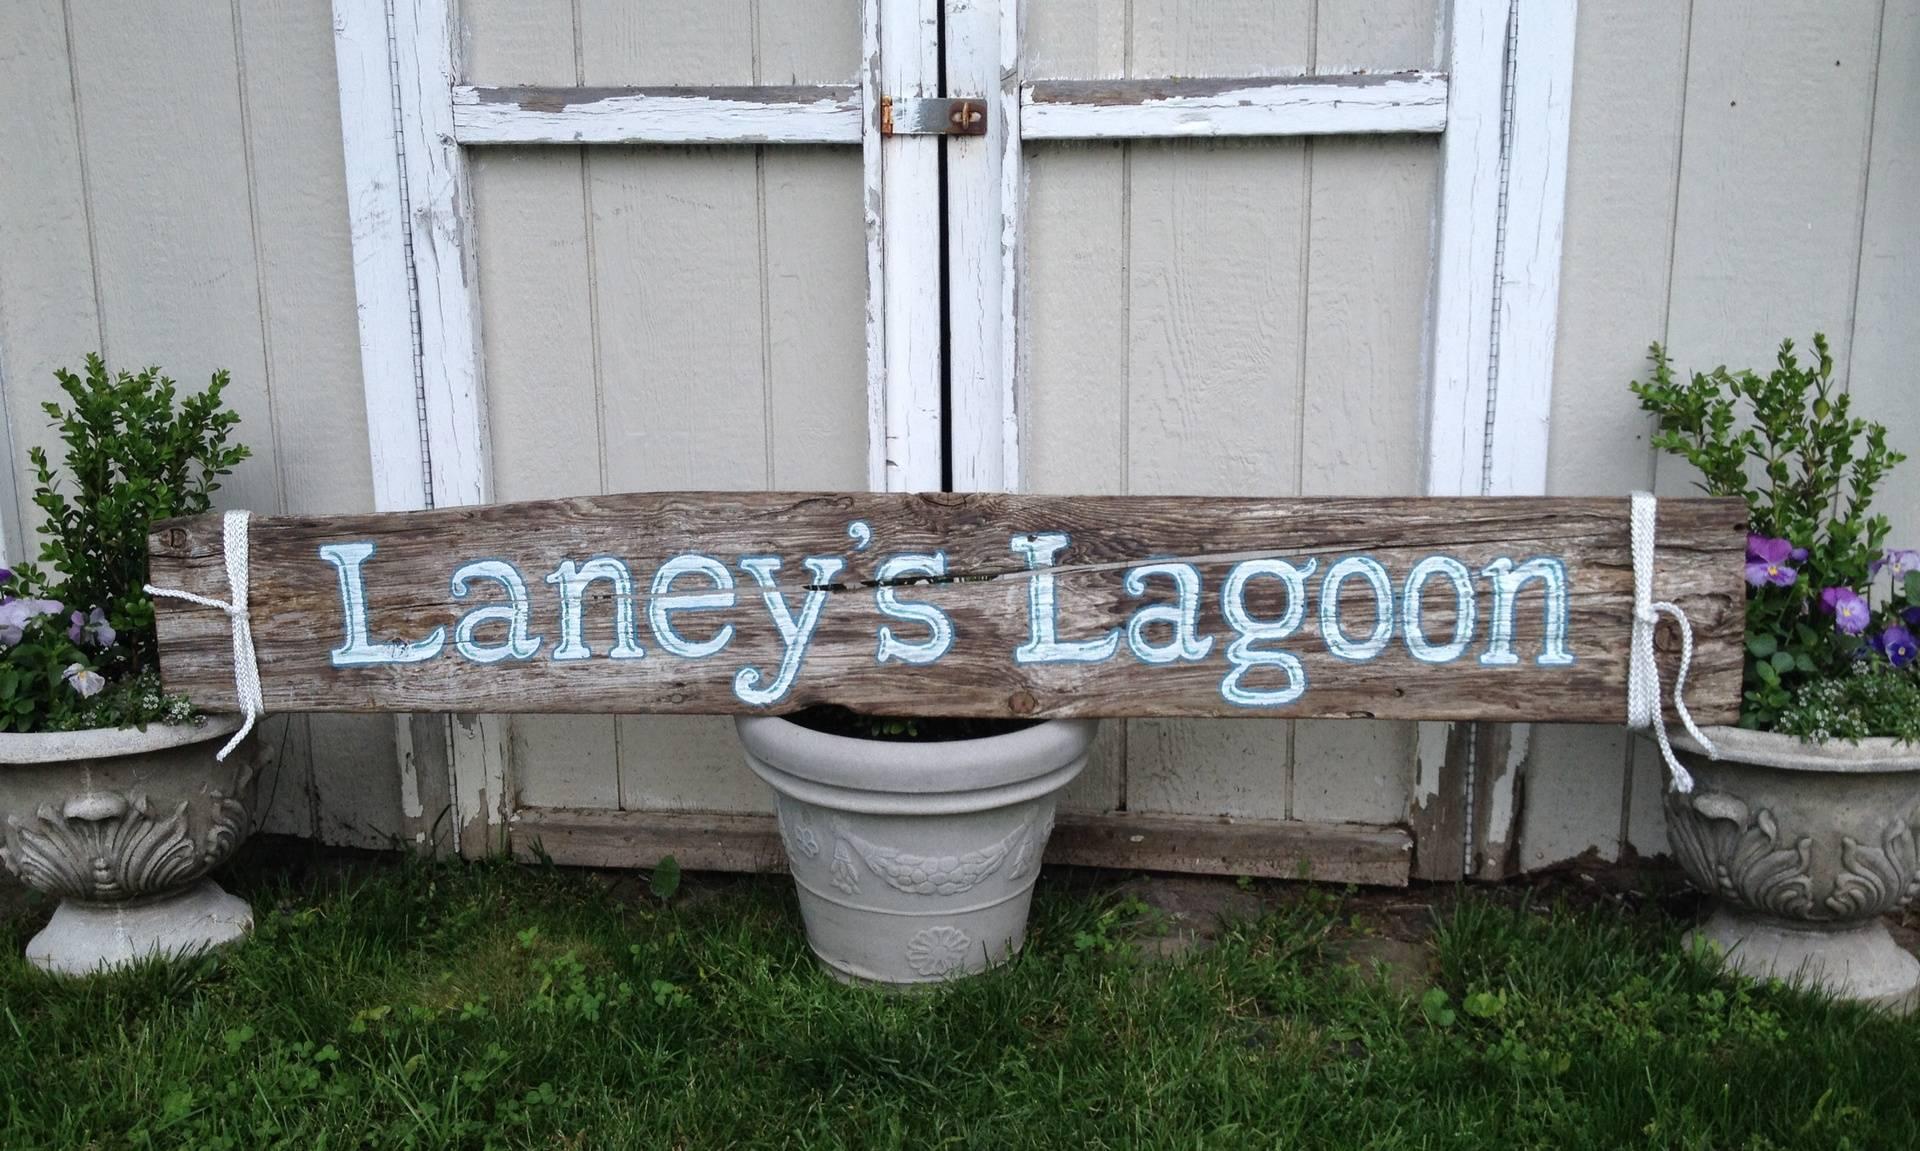 Laney's Lagoon